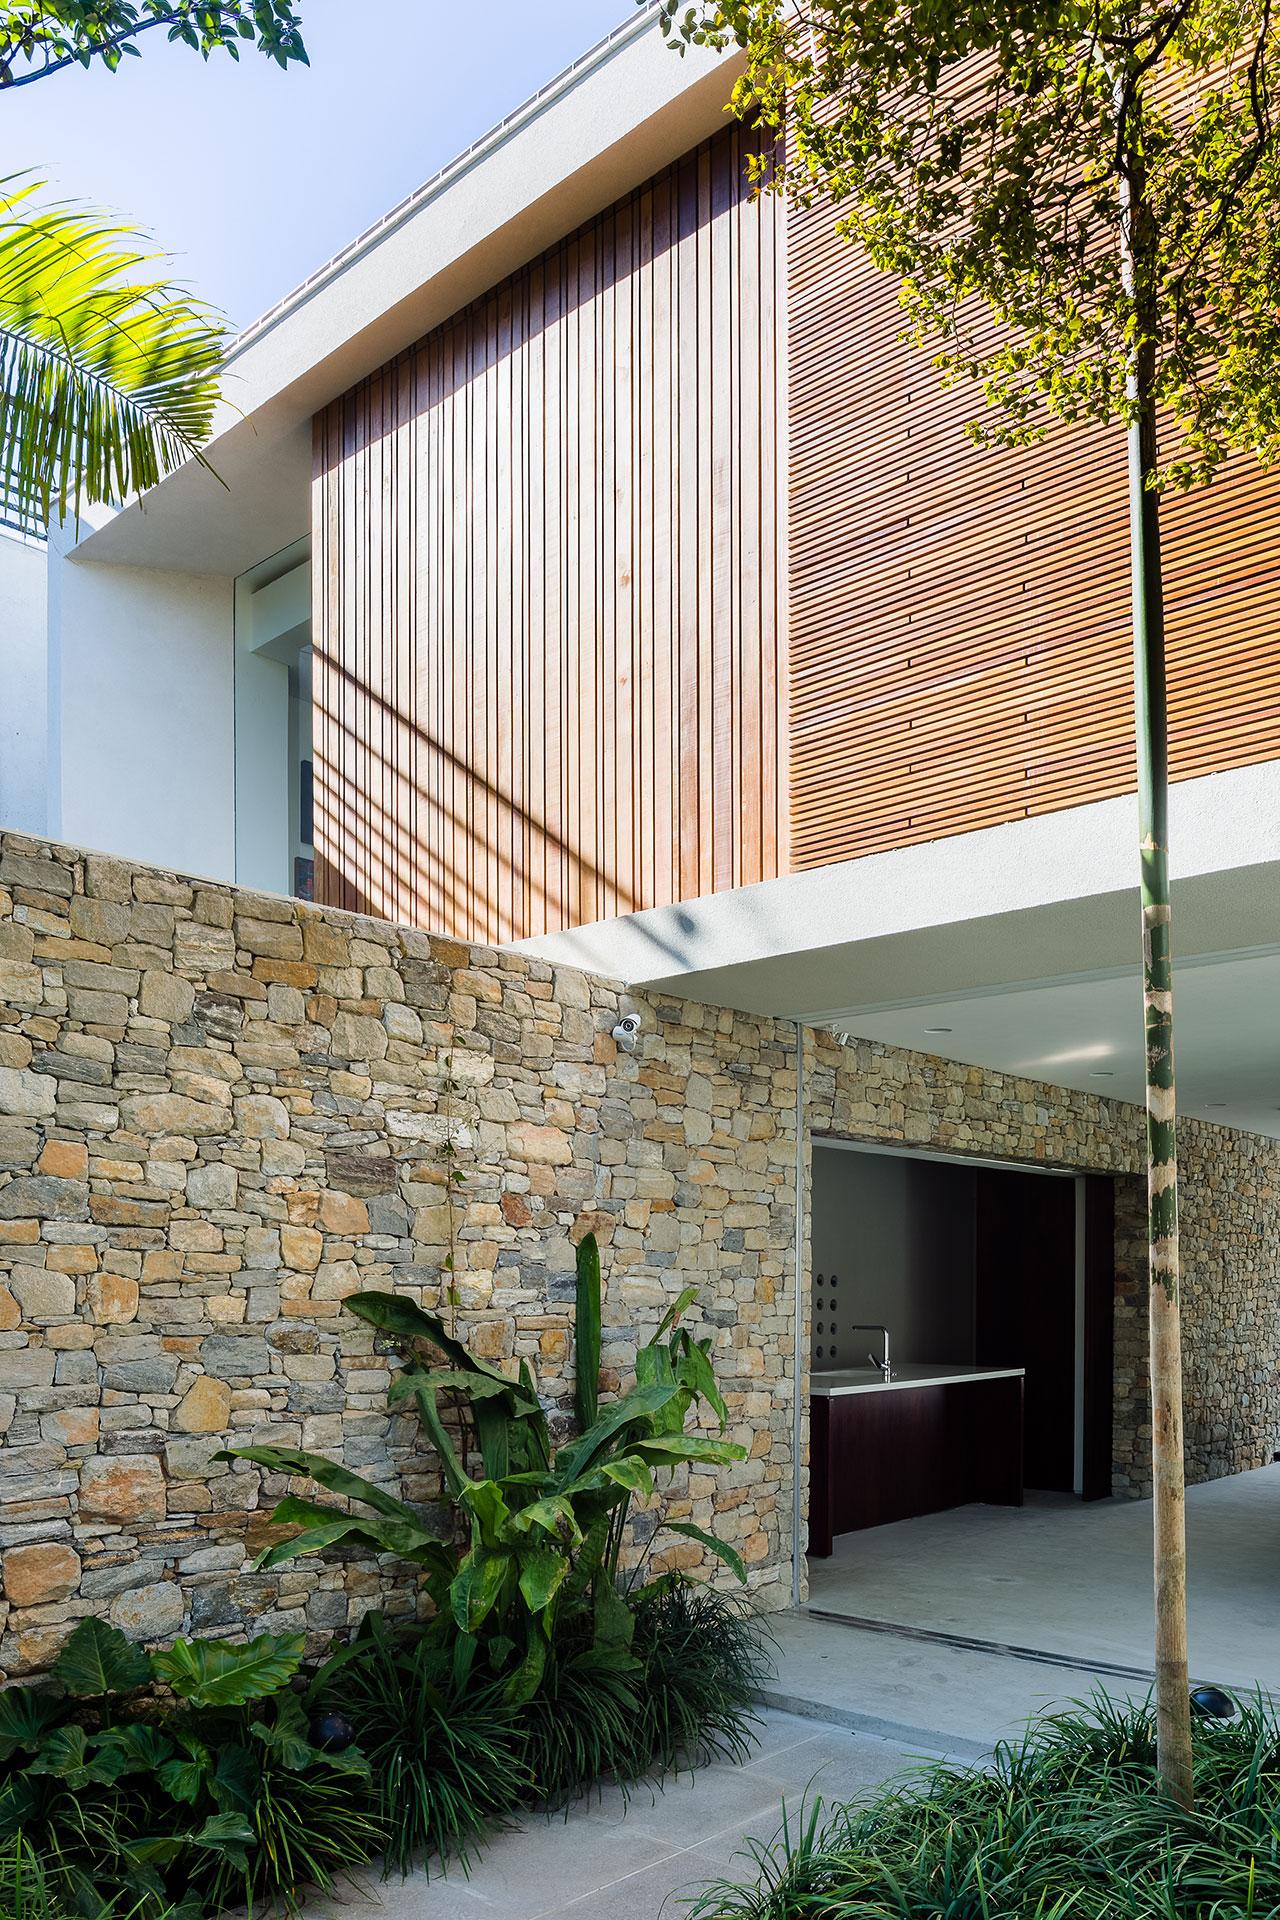 casa lara by felipe hess Lara House in Brasil by Felipe Hess